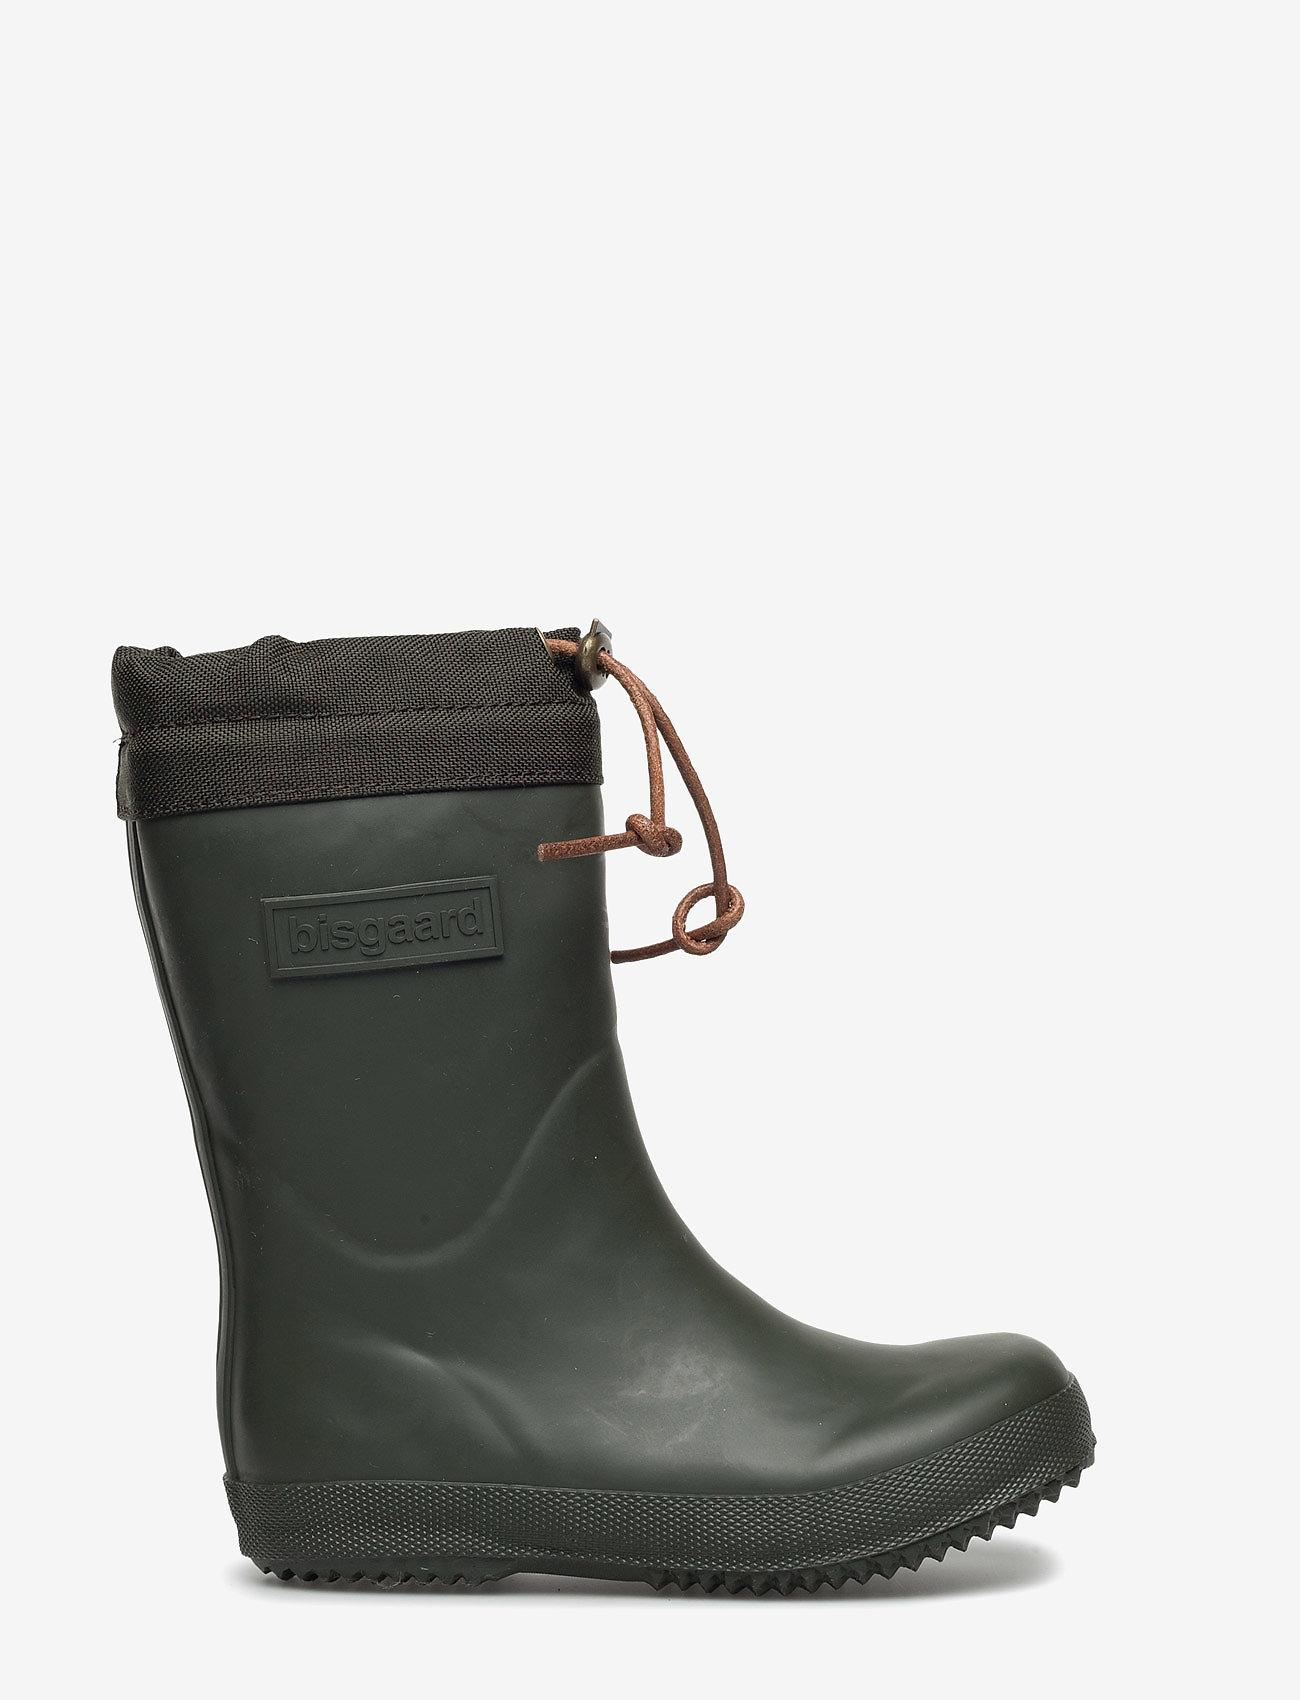 "Bisgaard - RUBBER BOOT - ""WINTER THERMO"" - gummistøvler - 30 green - 1"